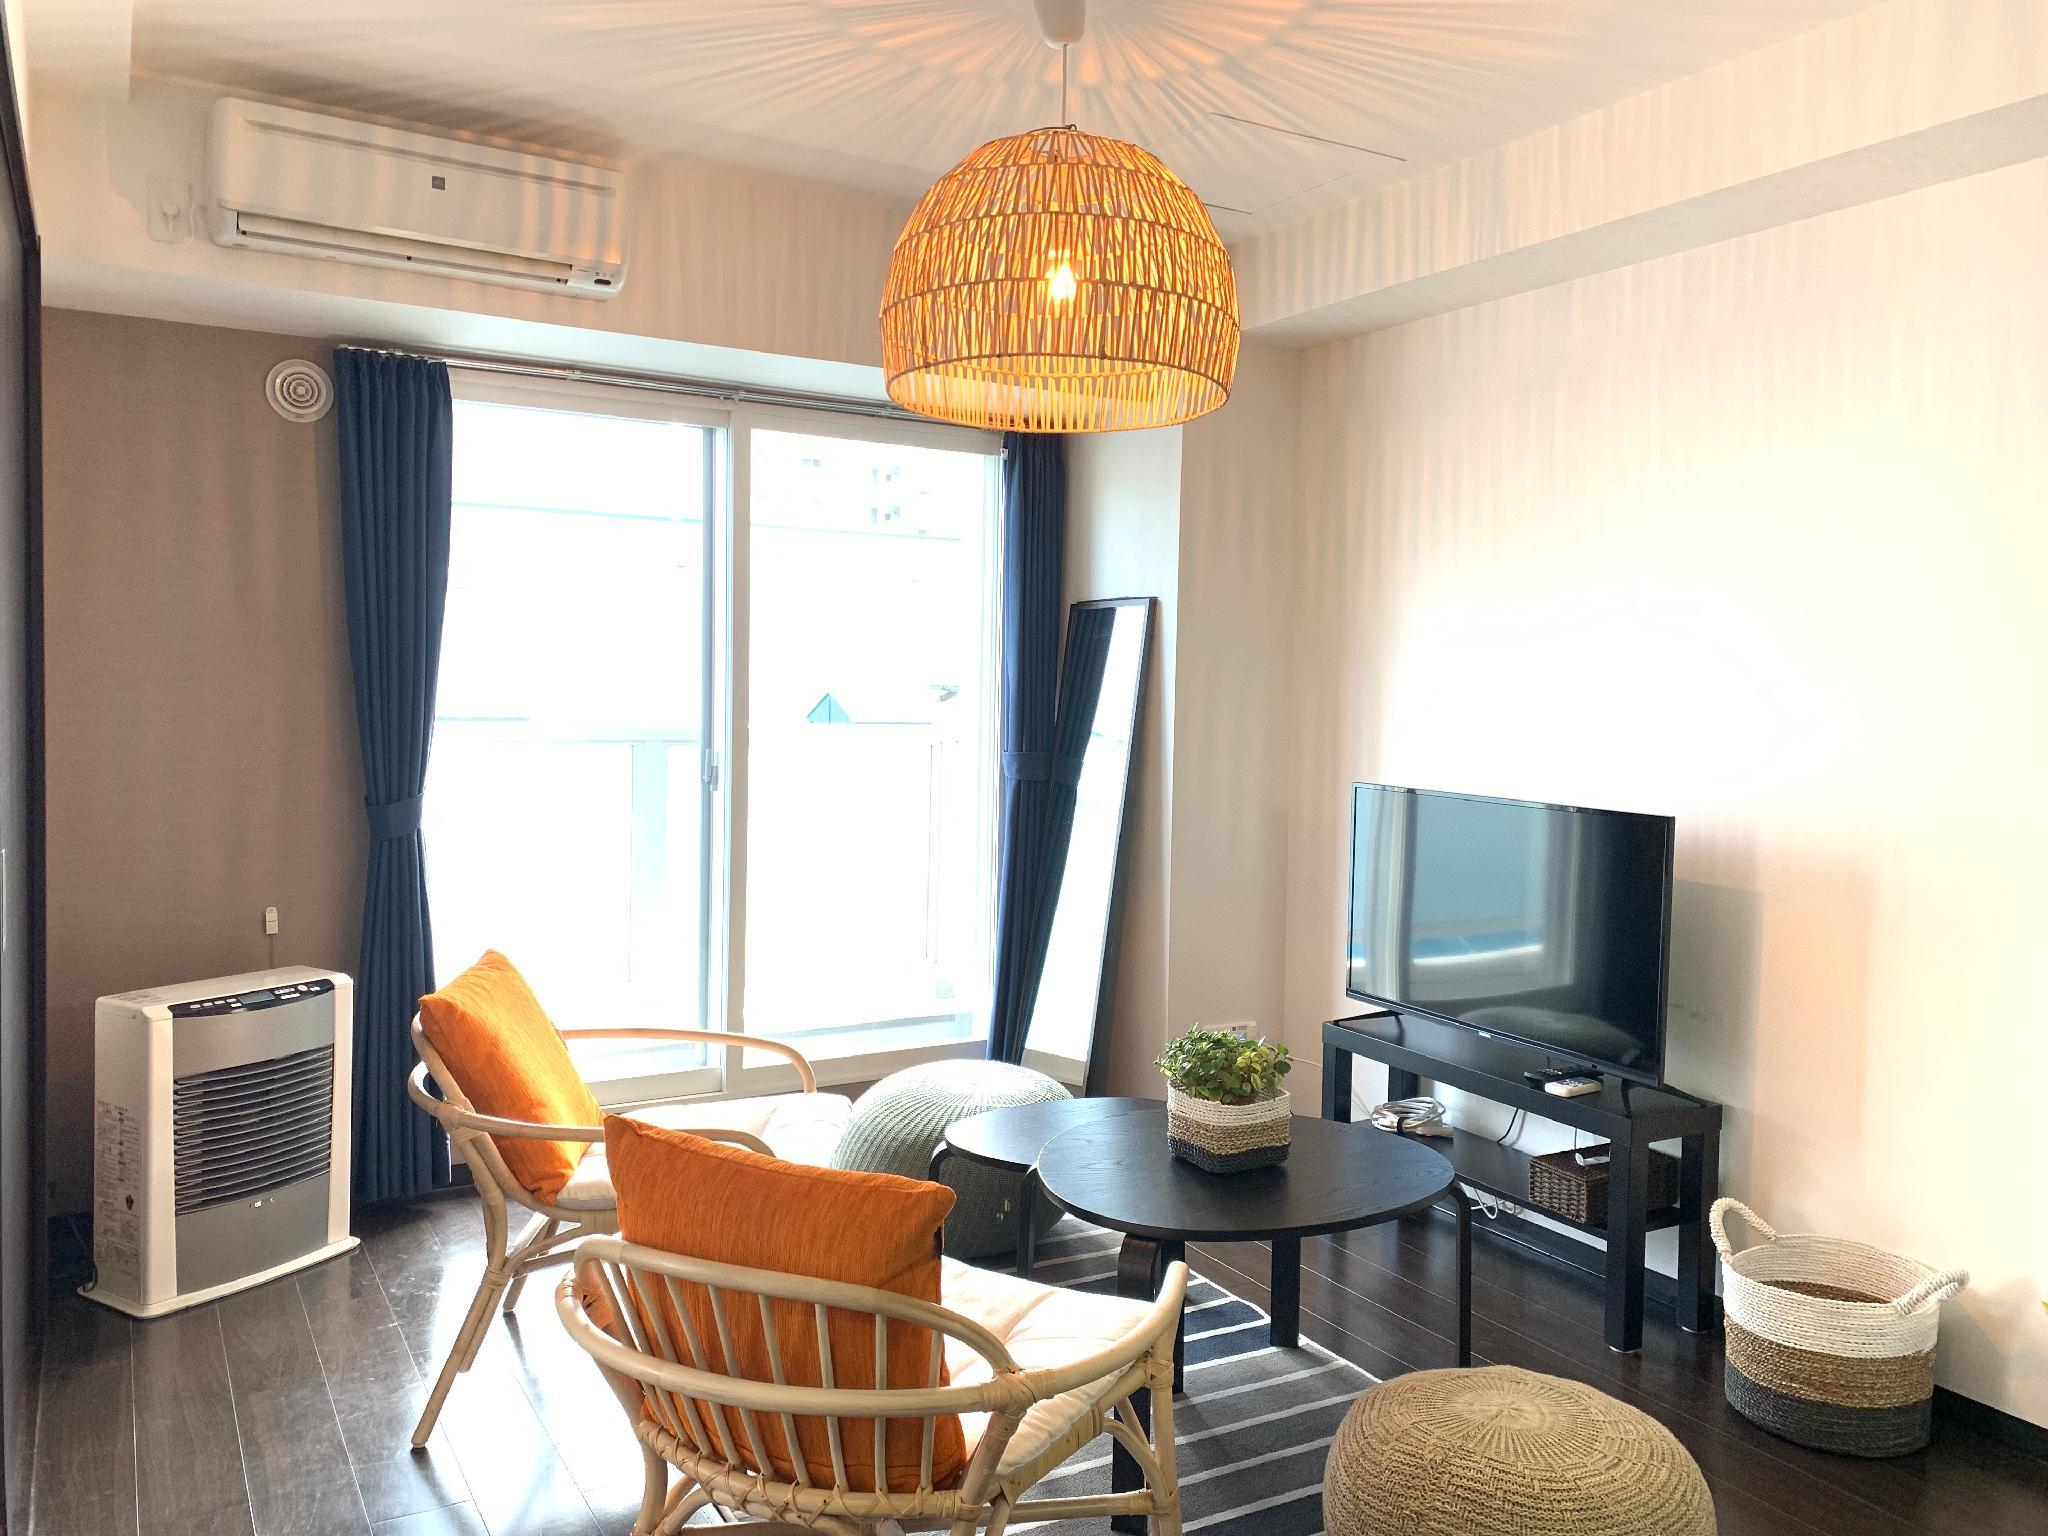 S62 32 1 Bedroom Apartment In Sapporo